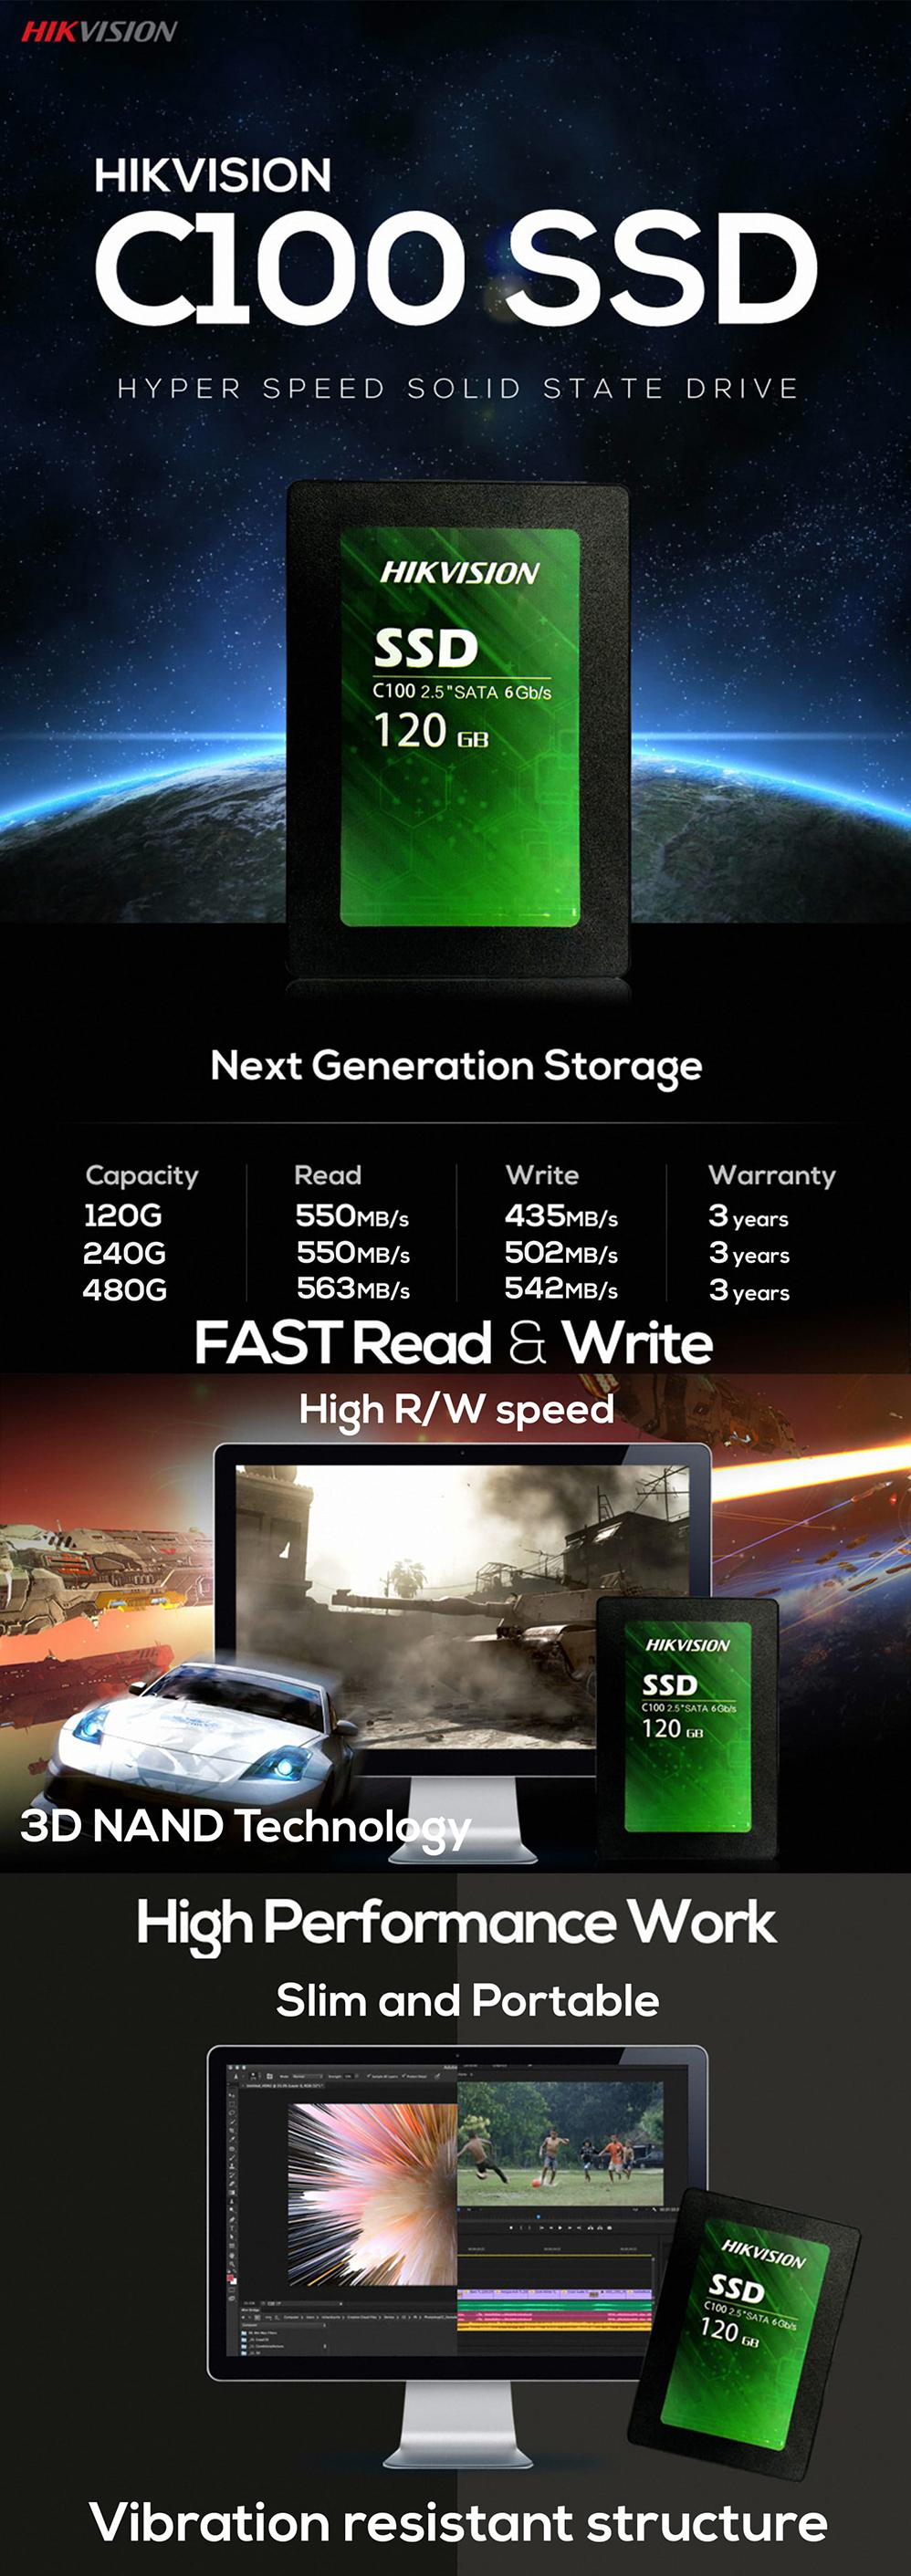 HIKVISION 120GB C100 SSD